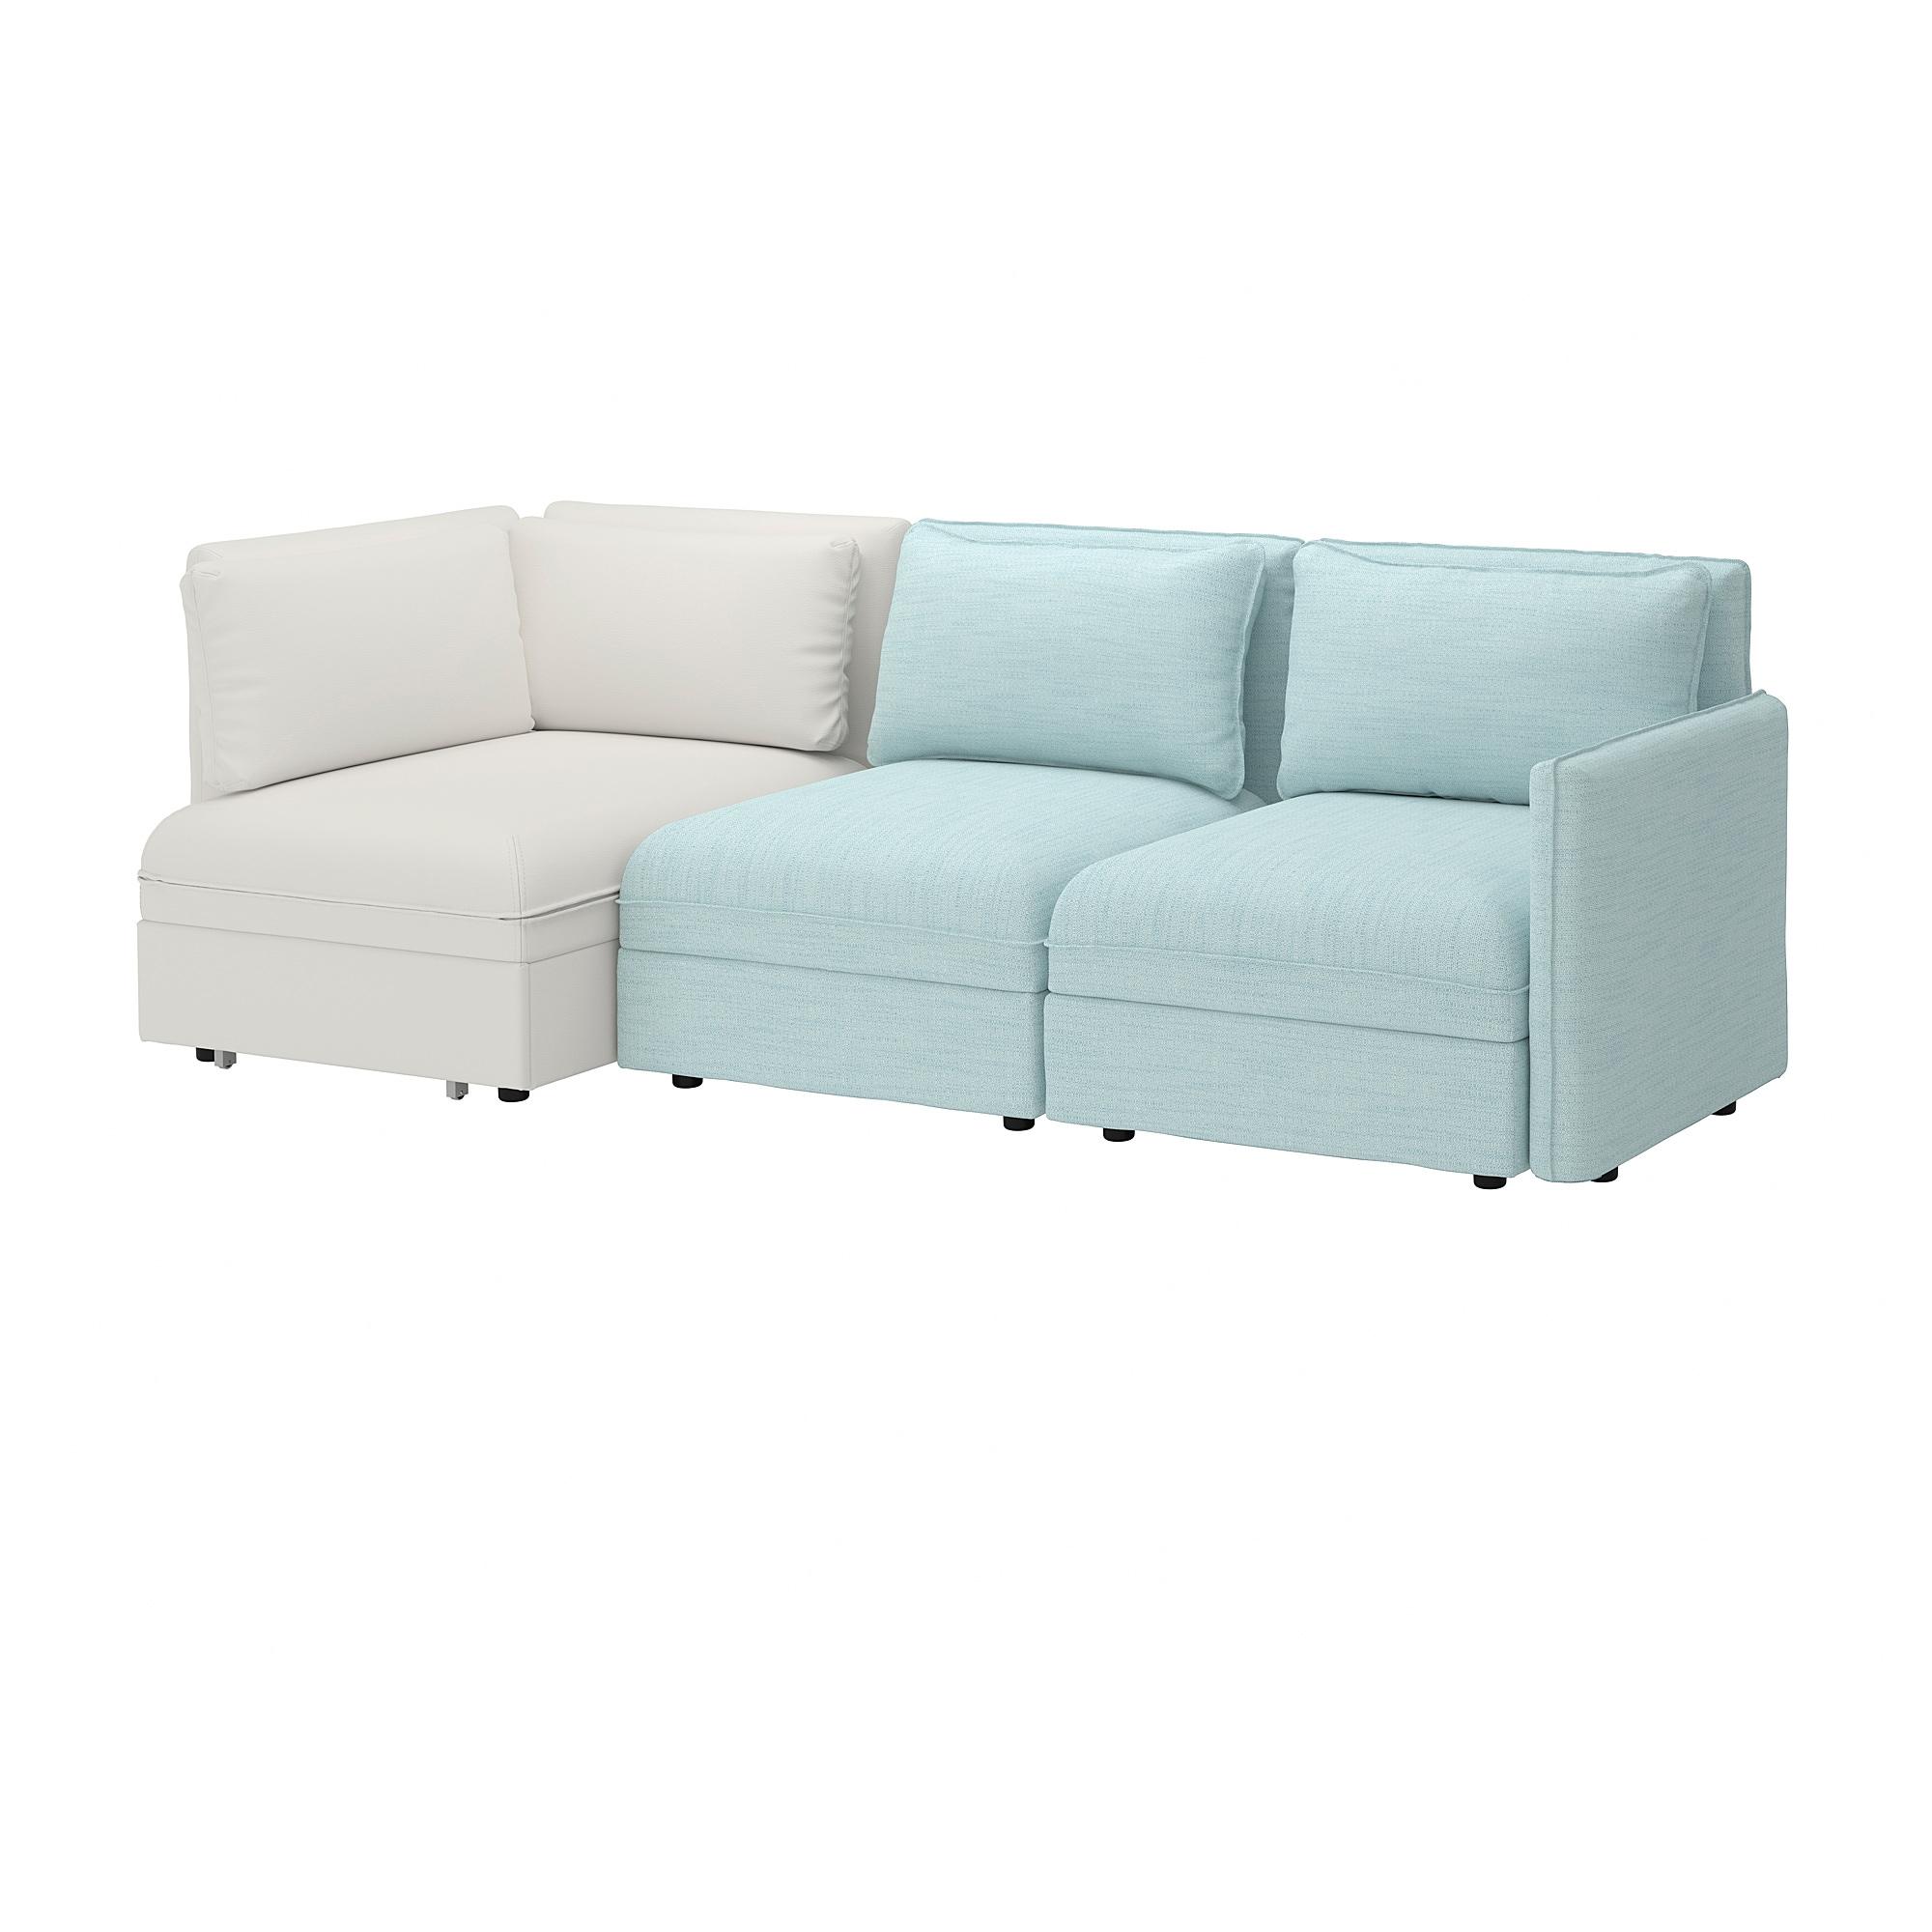 Vallentuna 3 Seat Modular Sleeper Sofa And Storage Hillared Murum Light Blue White Modular Corner Sofa Ikea Corner Sofa